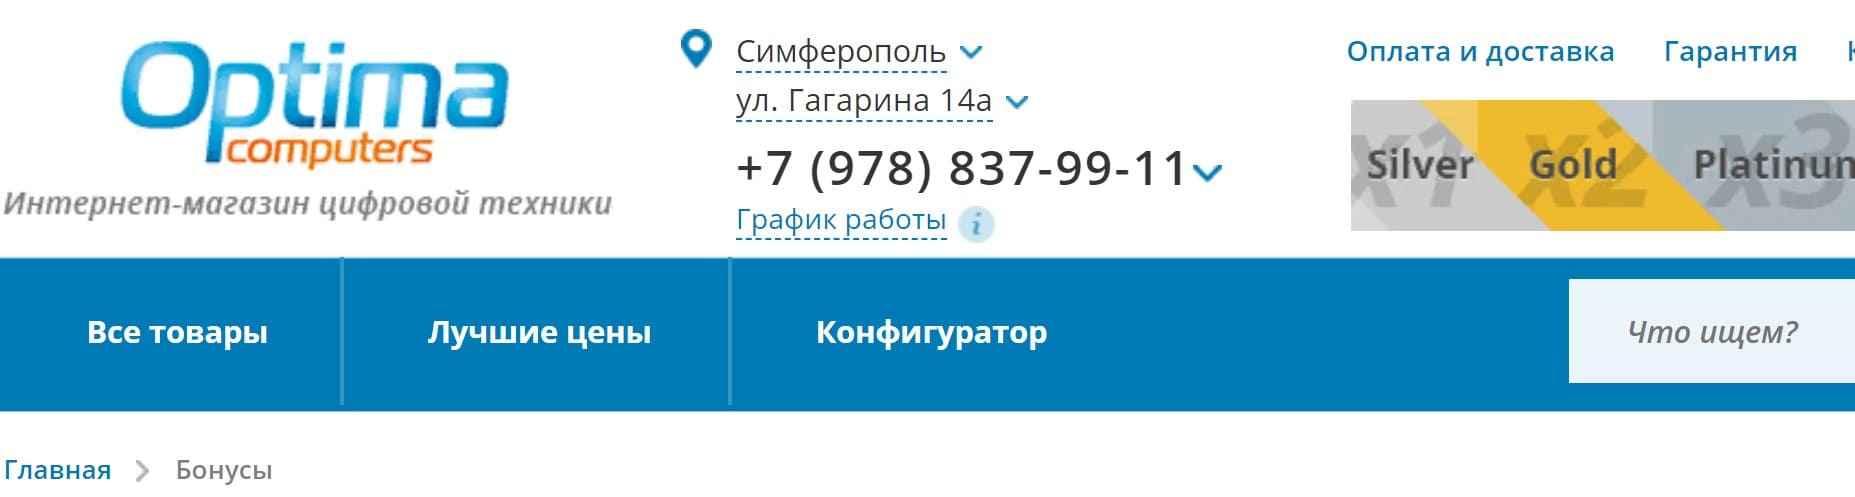 Оптима Крым личный кабинет